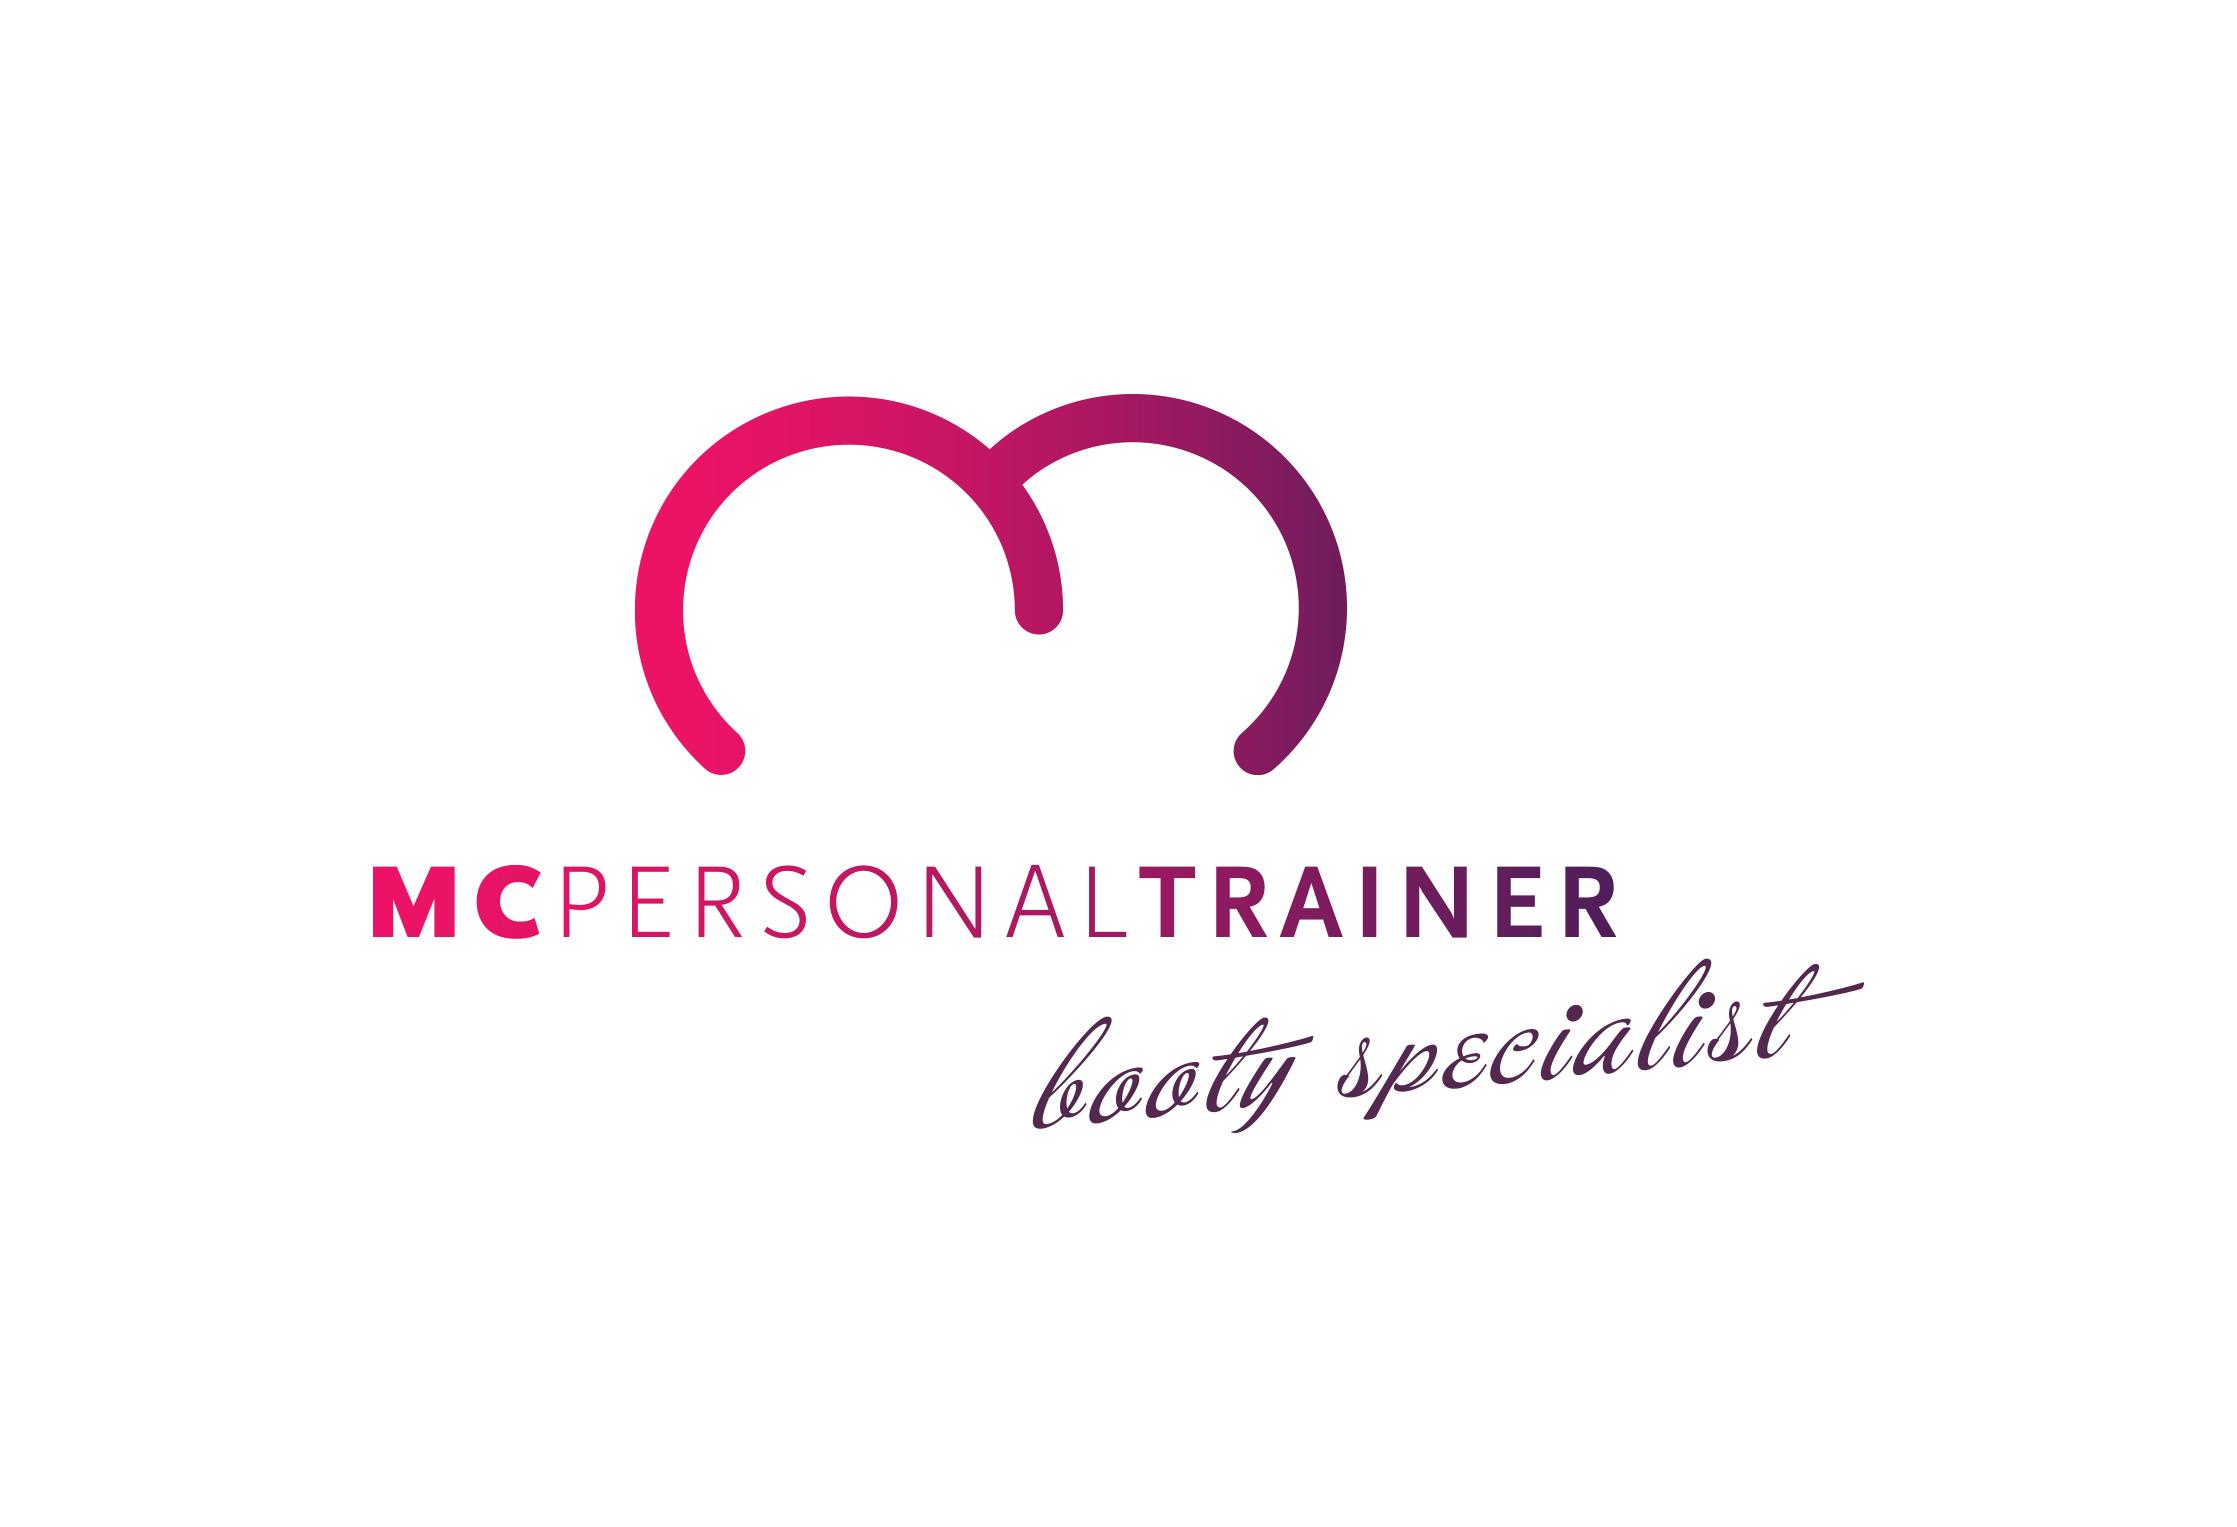 MC Personal Trainer